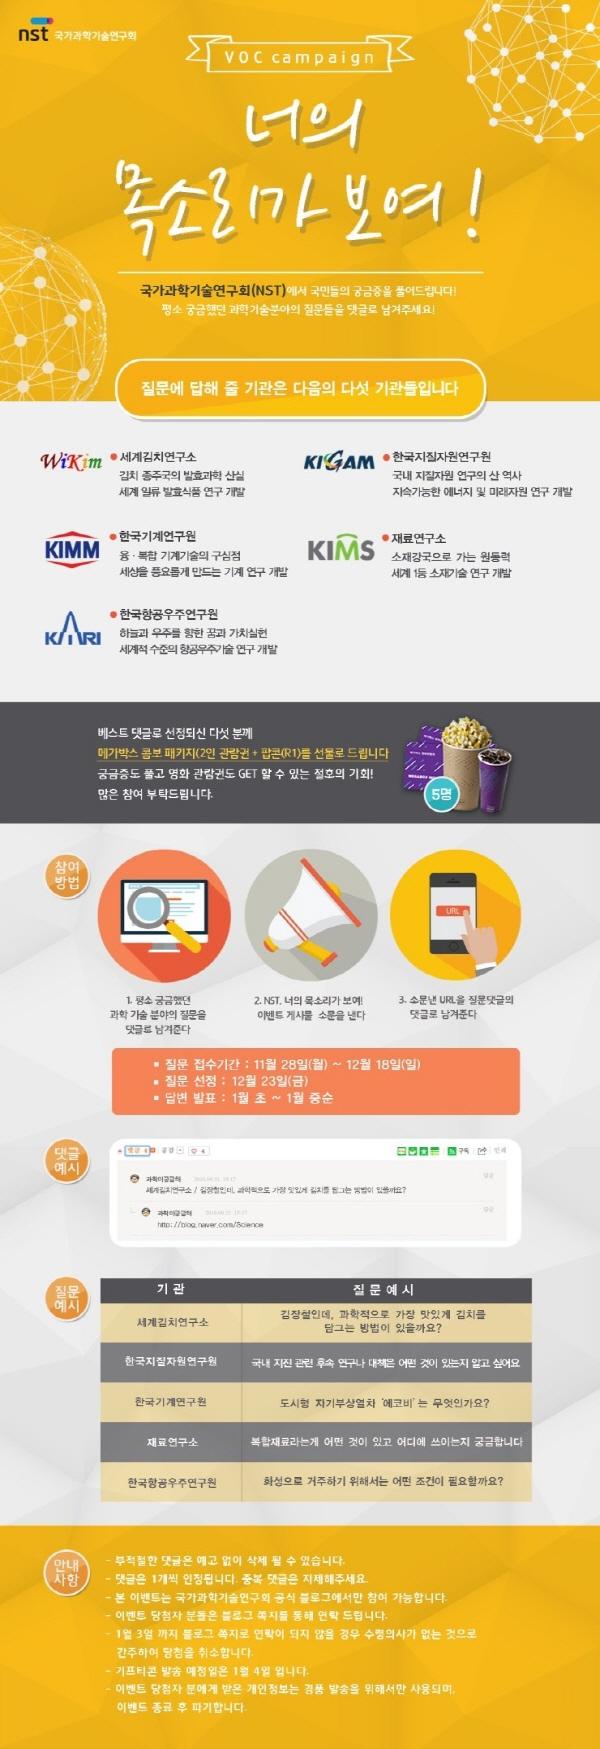 allcon-poster.jpg